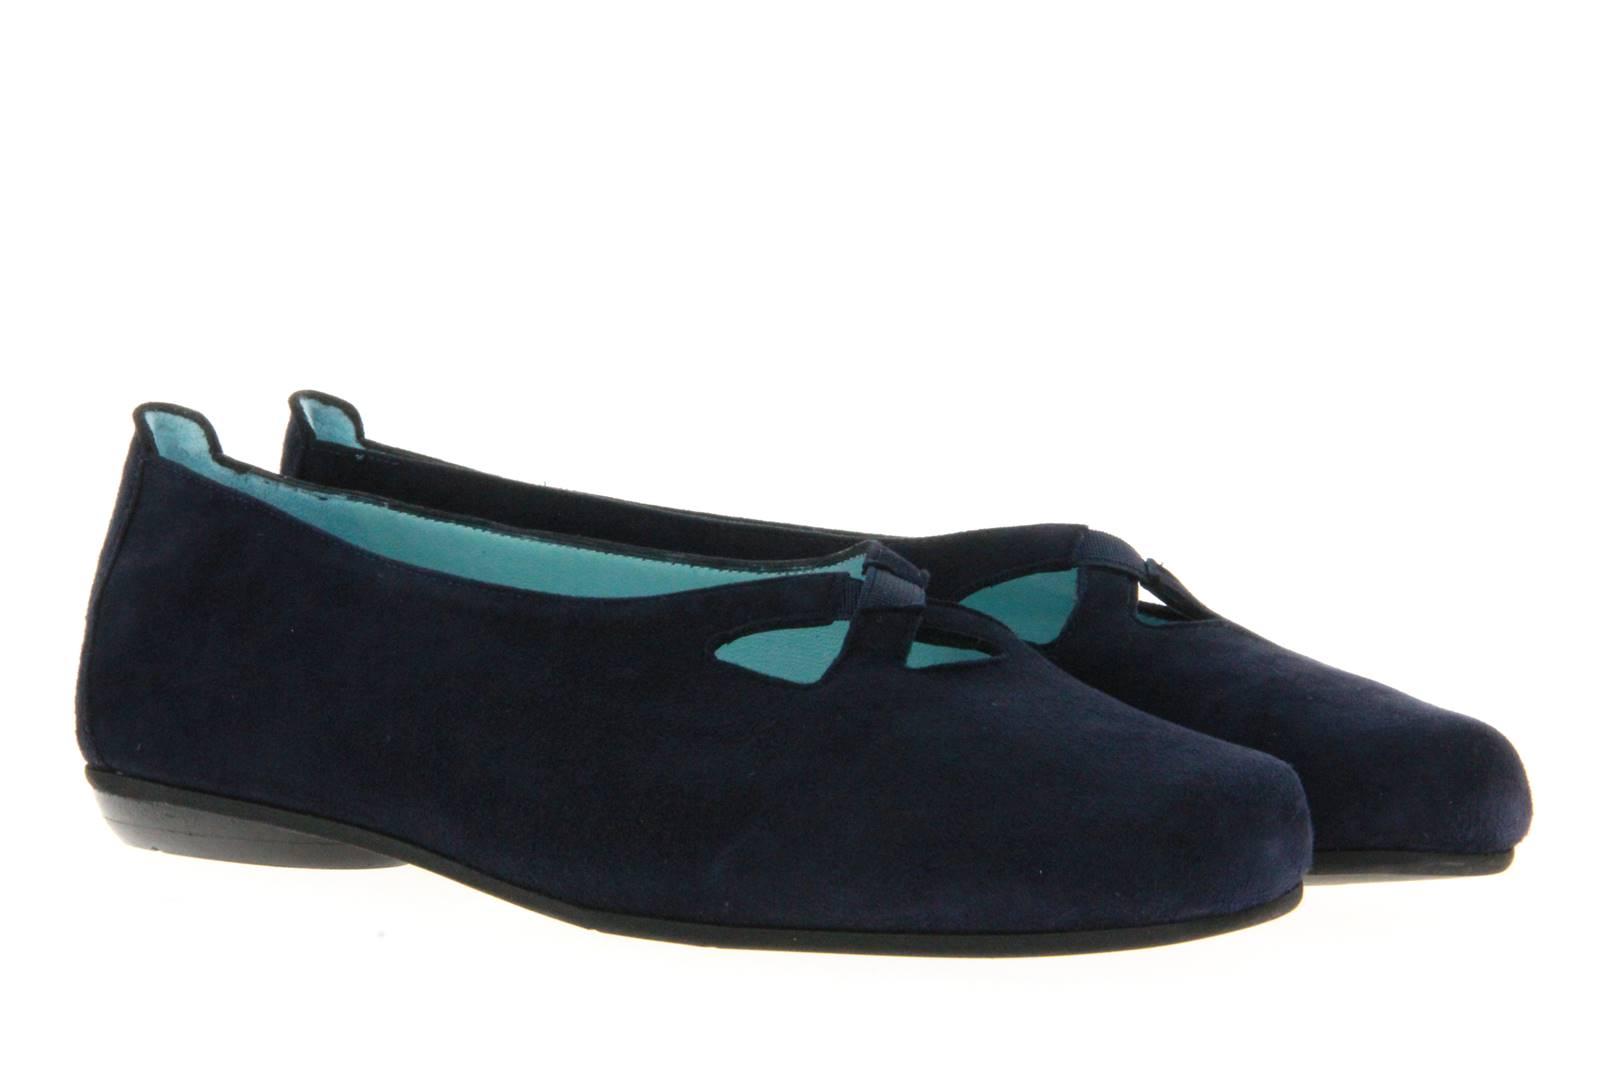 Thierry Rabotin Ballet Flat CAMOSCIO BLU